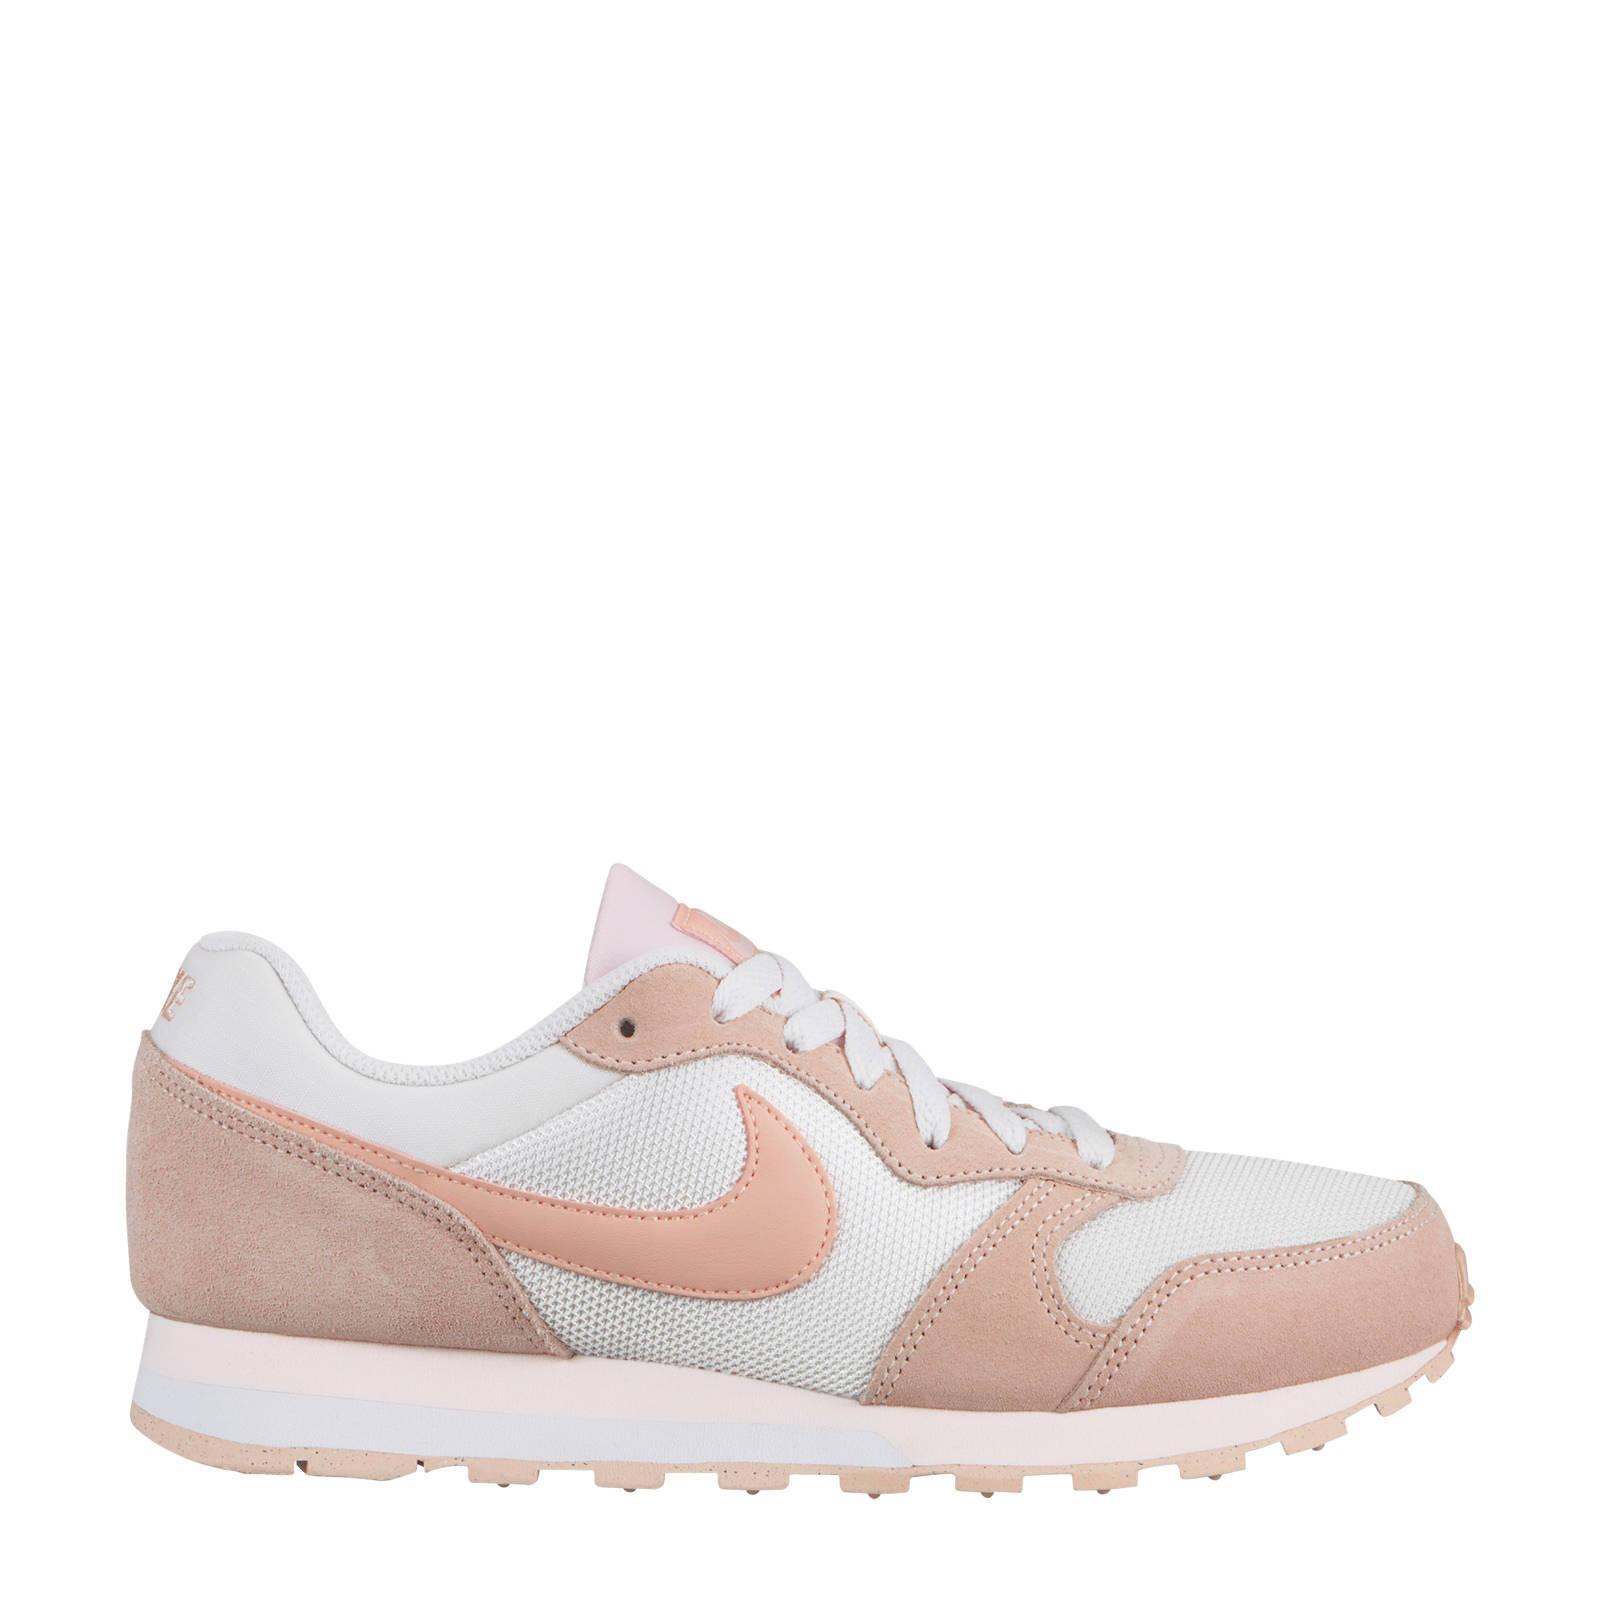 MD Runner 2 sneakers rozewit